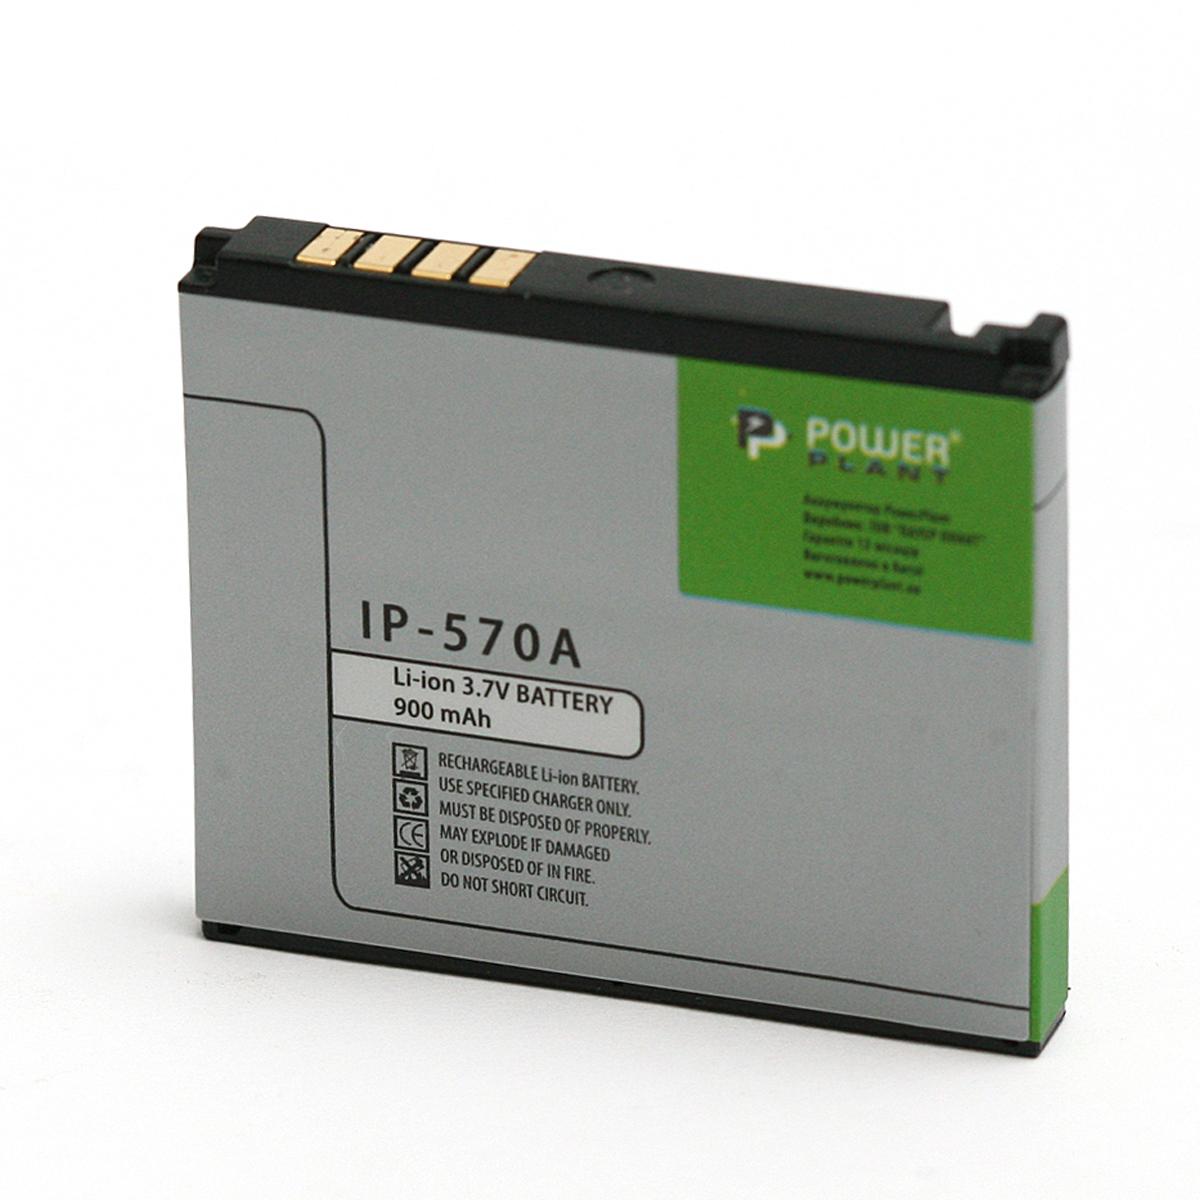 Купить Аккумулятор PowerPlant LG KC550 (IP-570A) 900mAh